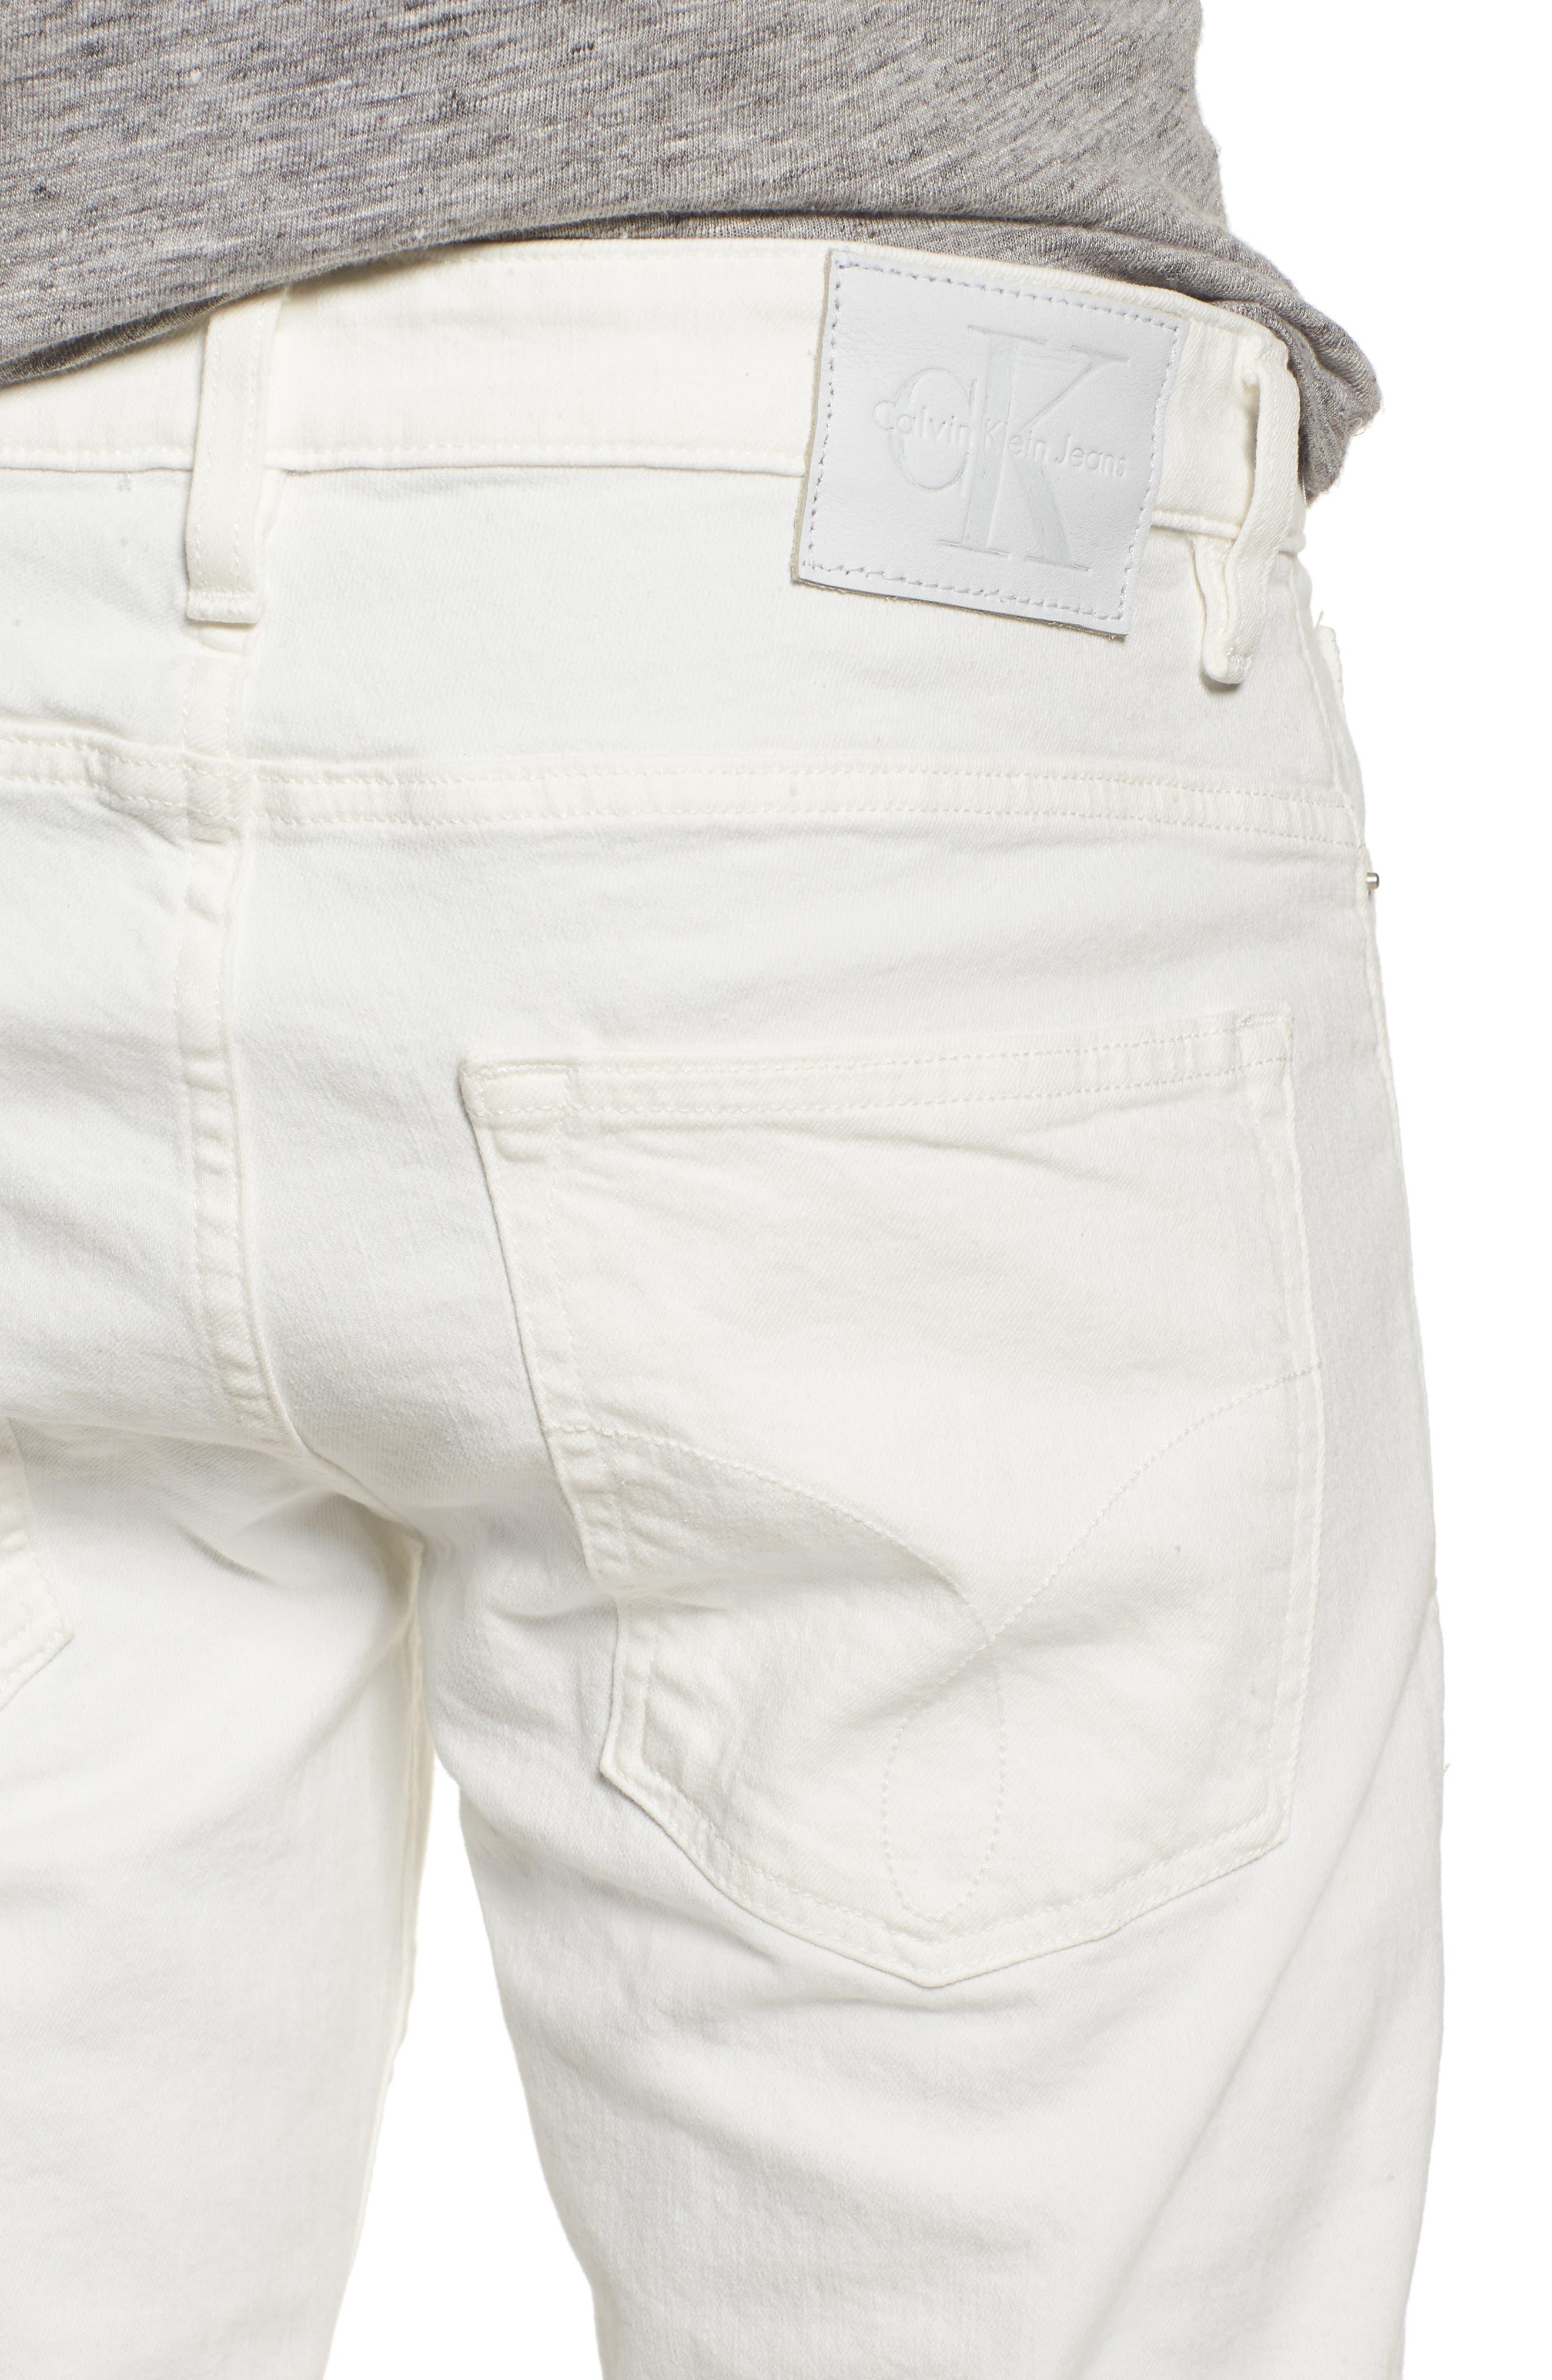 Slim Fit Jeans,                             Alternate thumbnail 4, color,                             GLASS